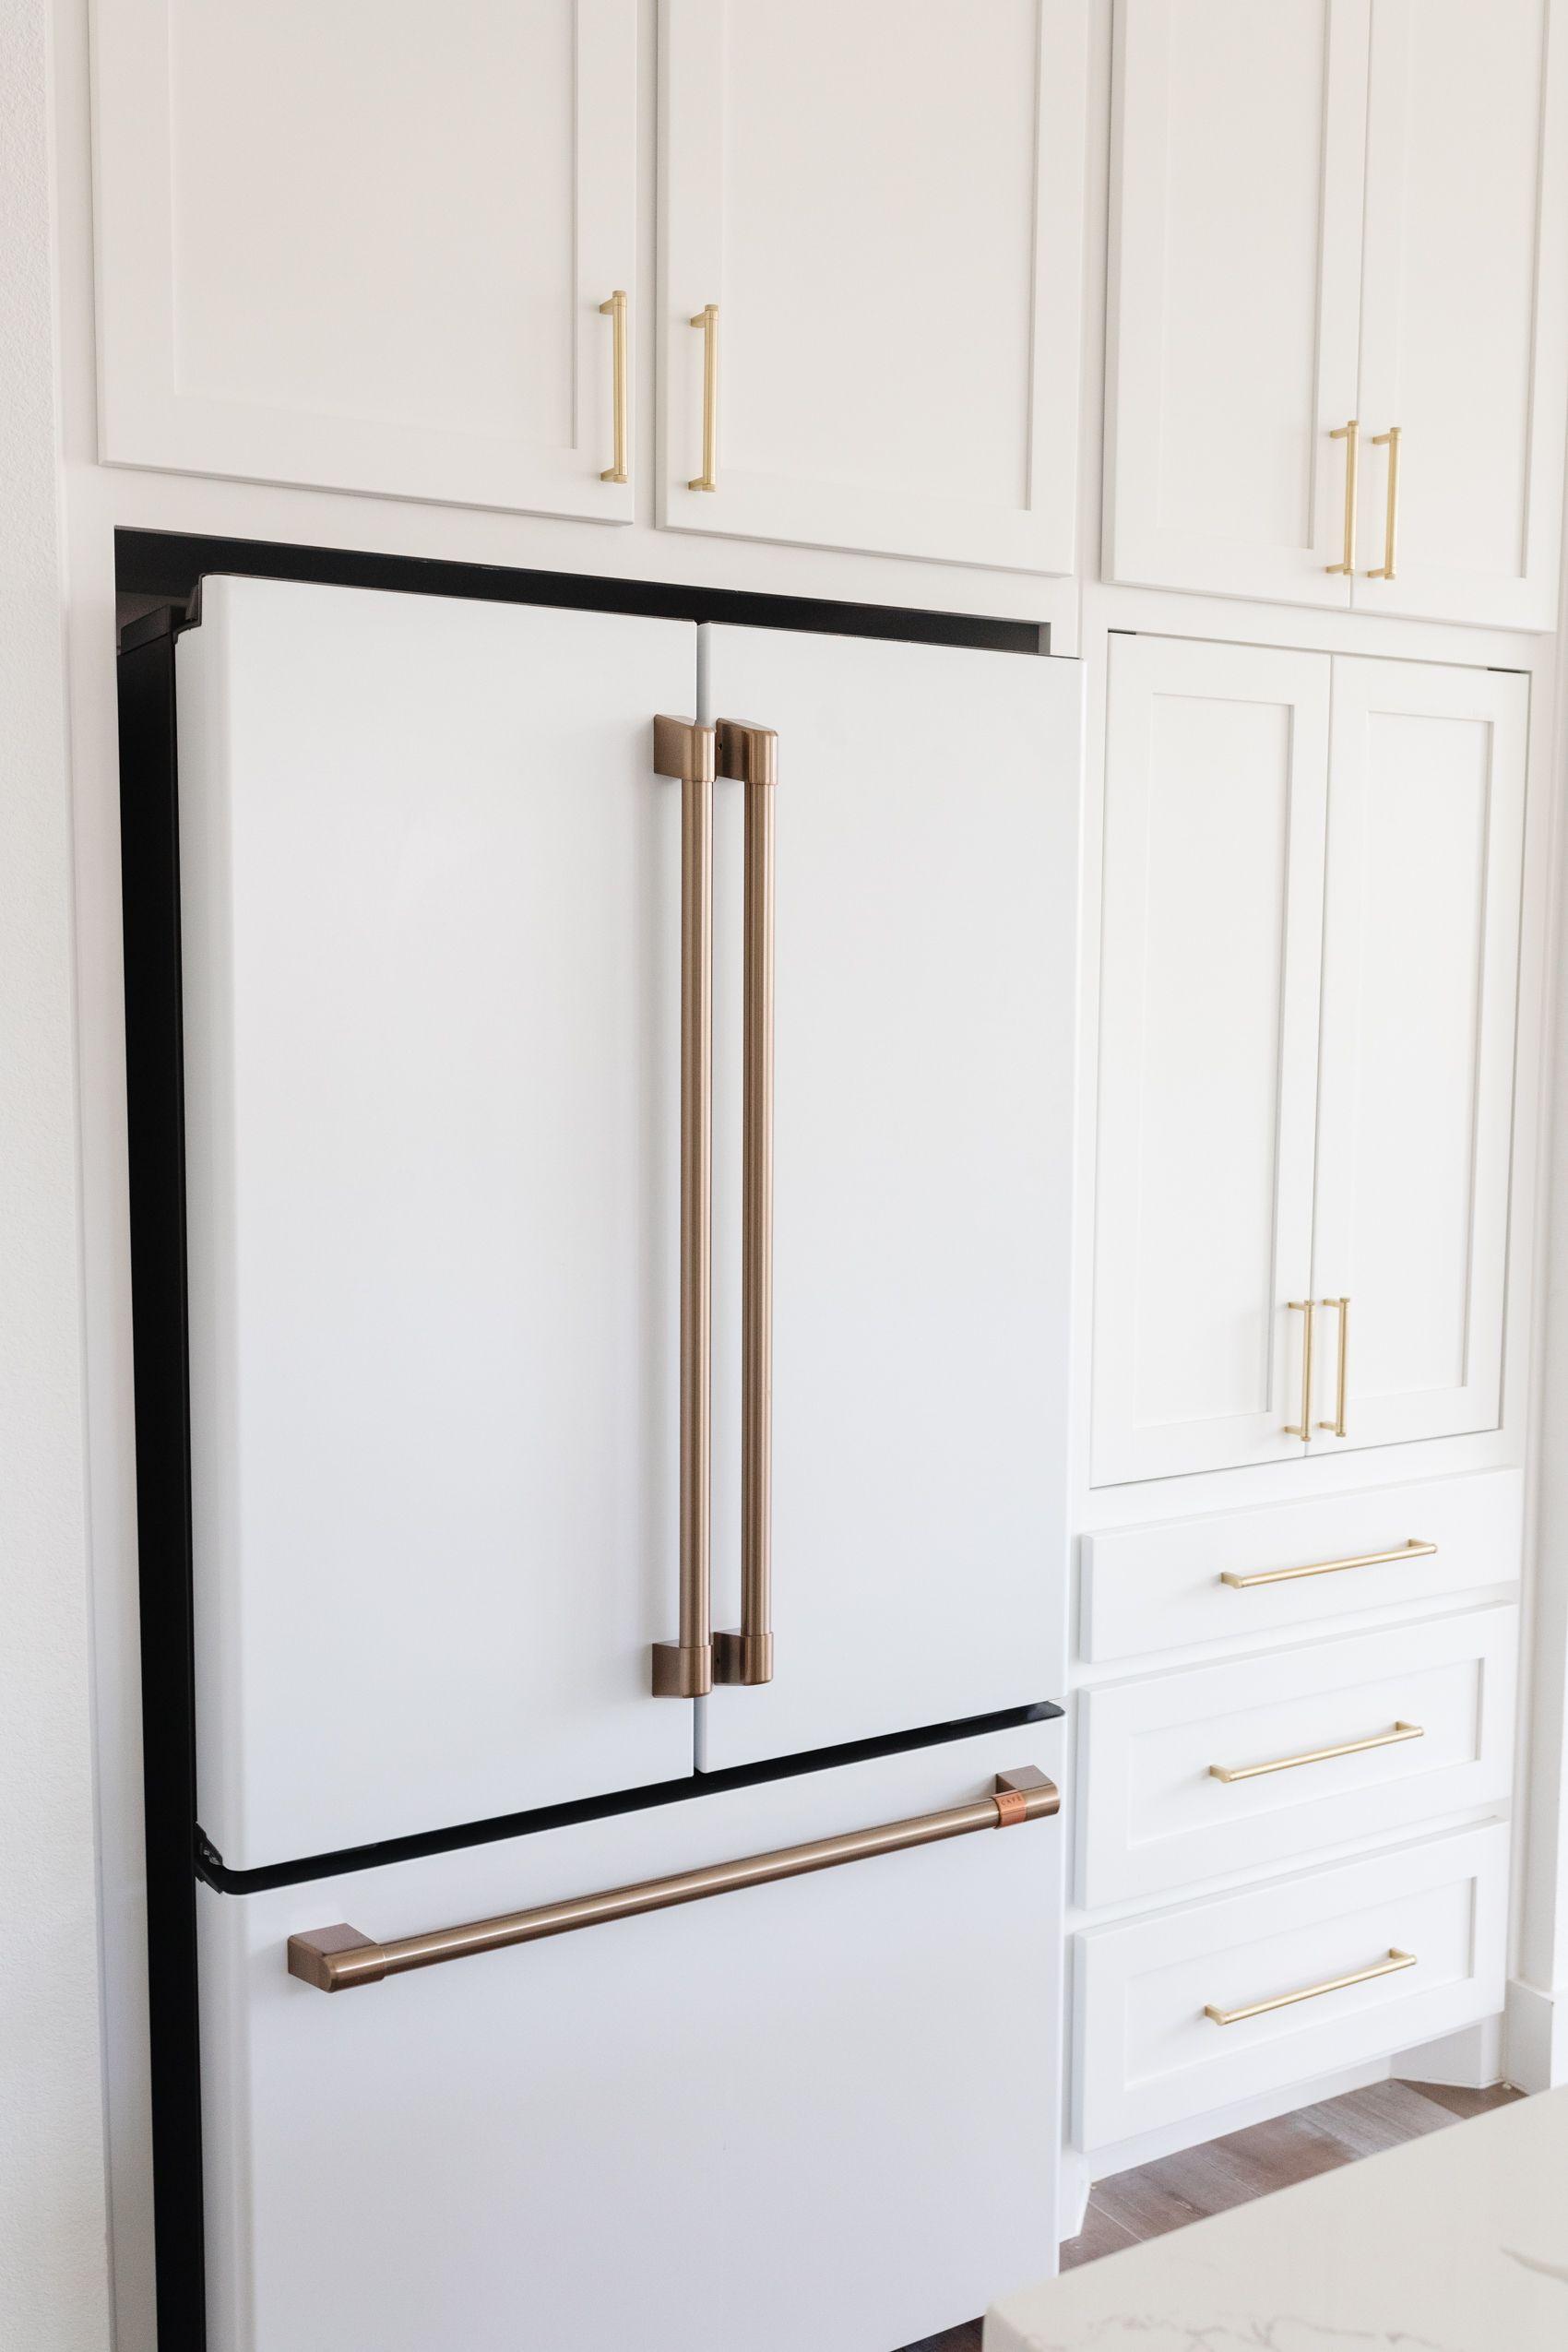 Luxury Ge Cafe Appliances Refrigerator Ge Cafe Appliances White Kitchen Appliances White Fridges